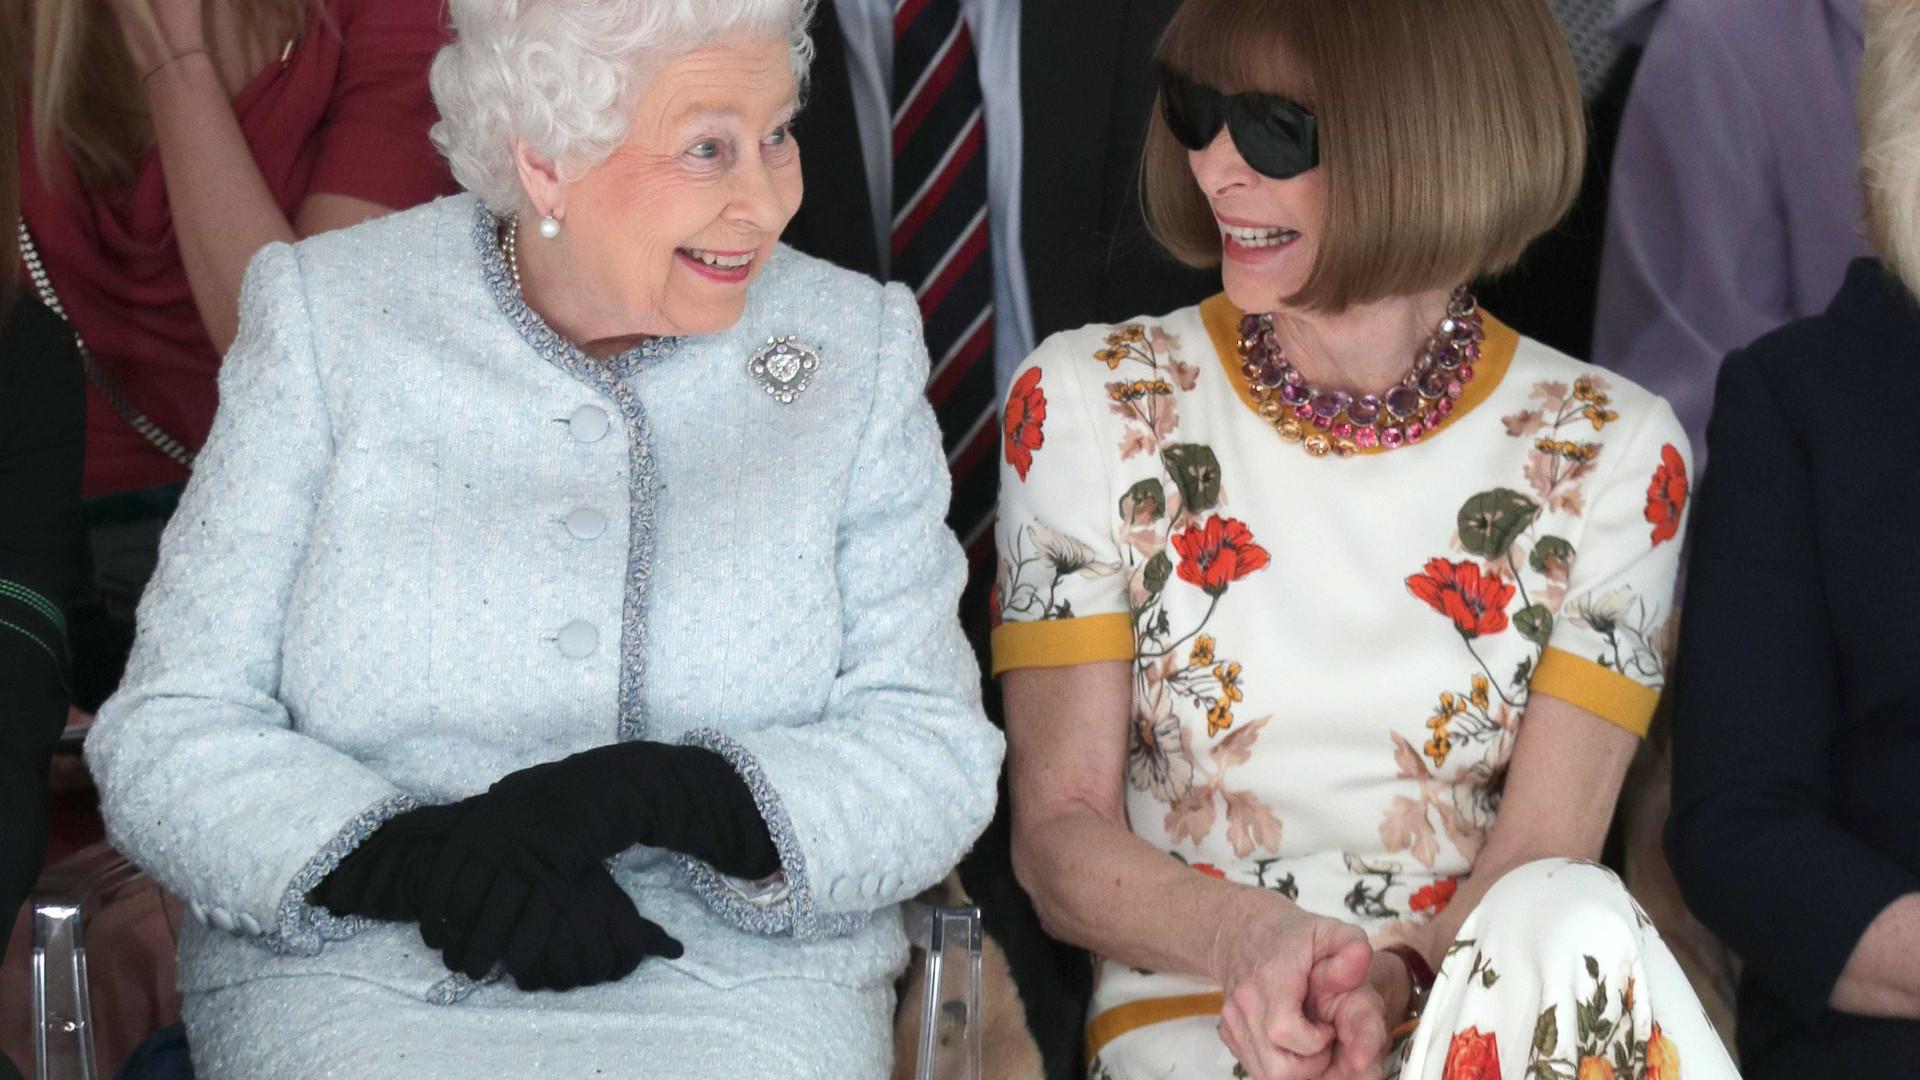 Aos 91, Rainha Elizabeth foi ao primeiro desfile de moda — Fofura